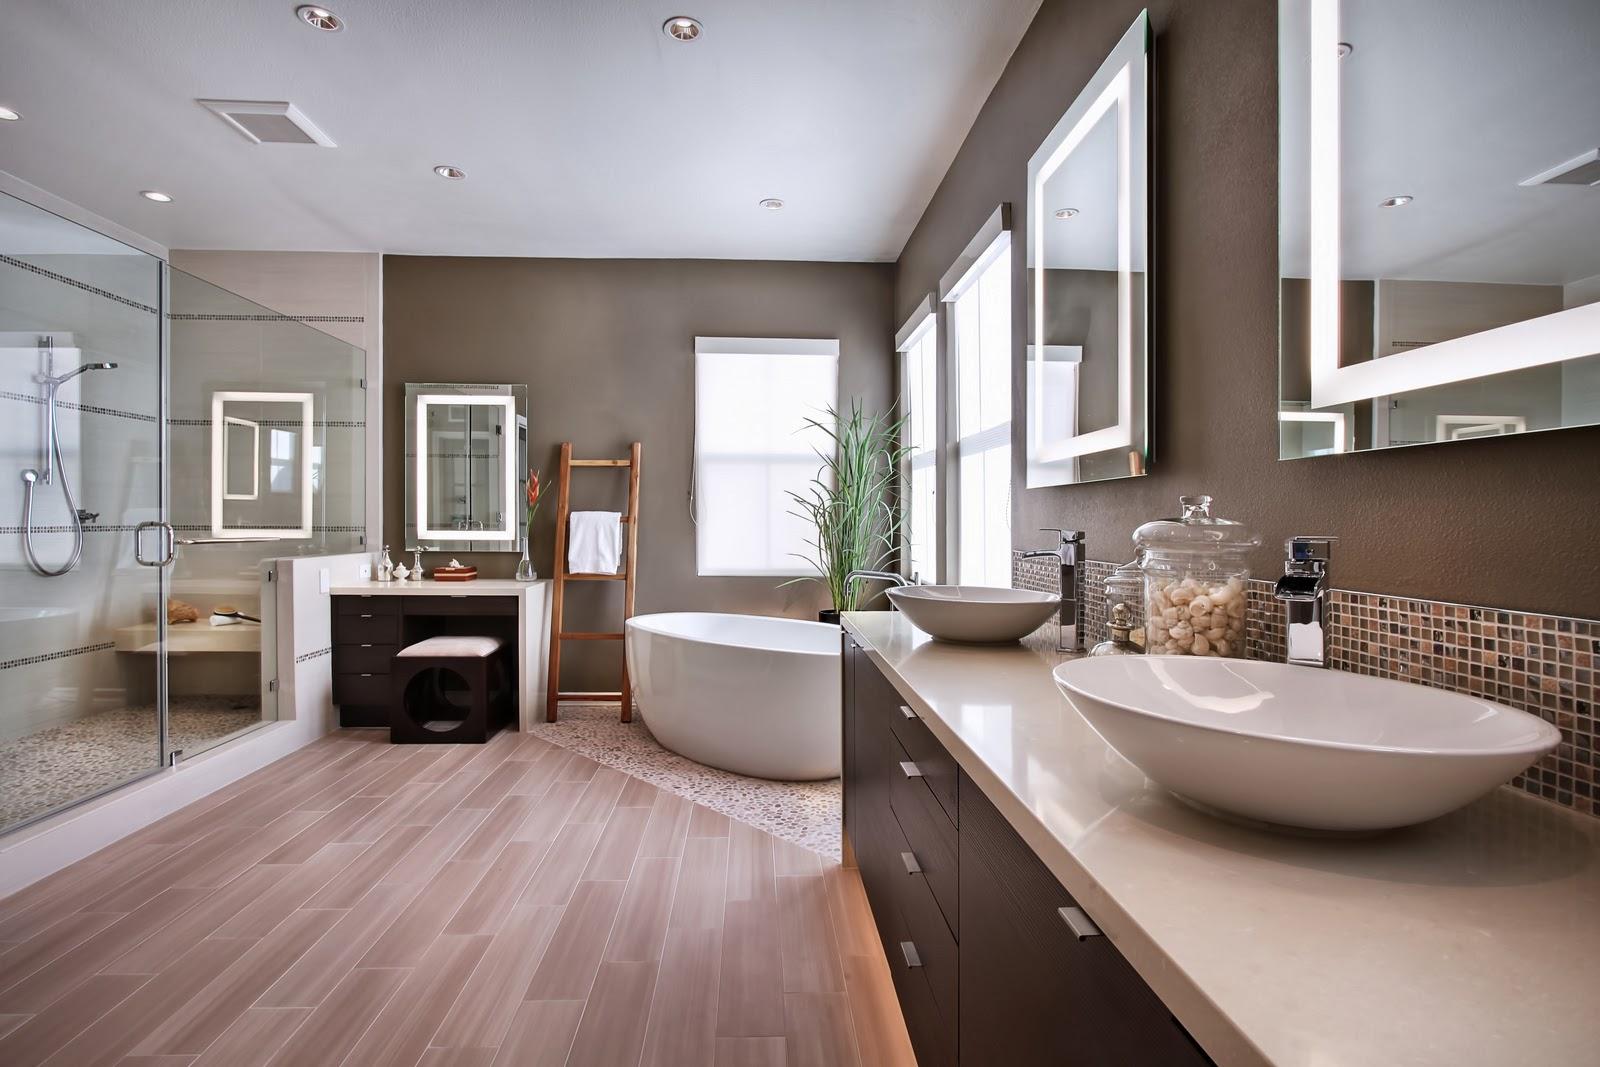 bathroom renovations maroubra